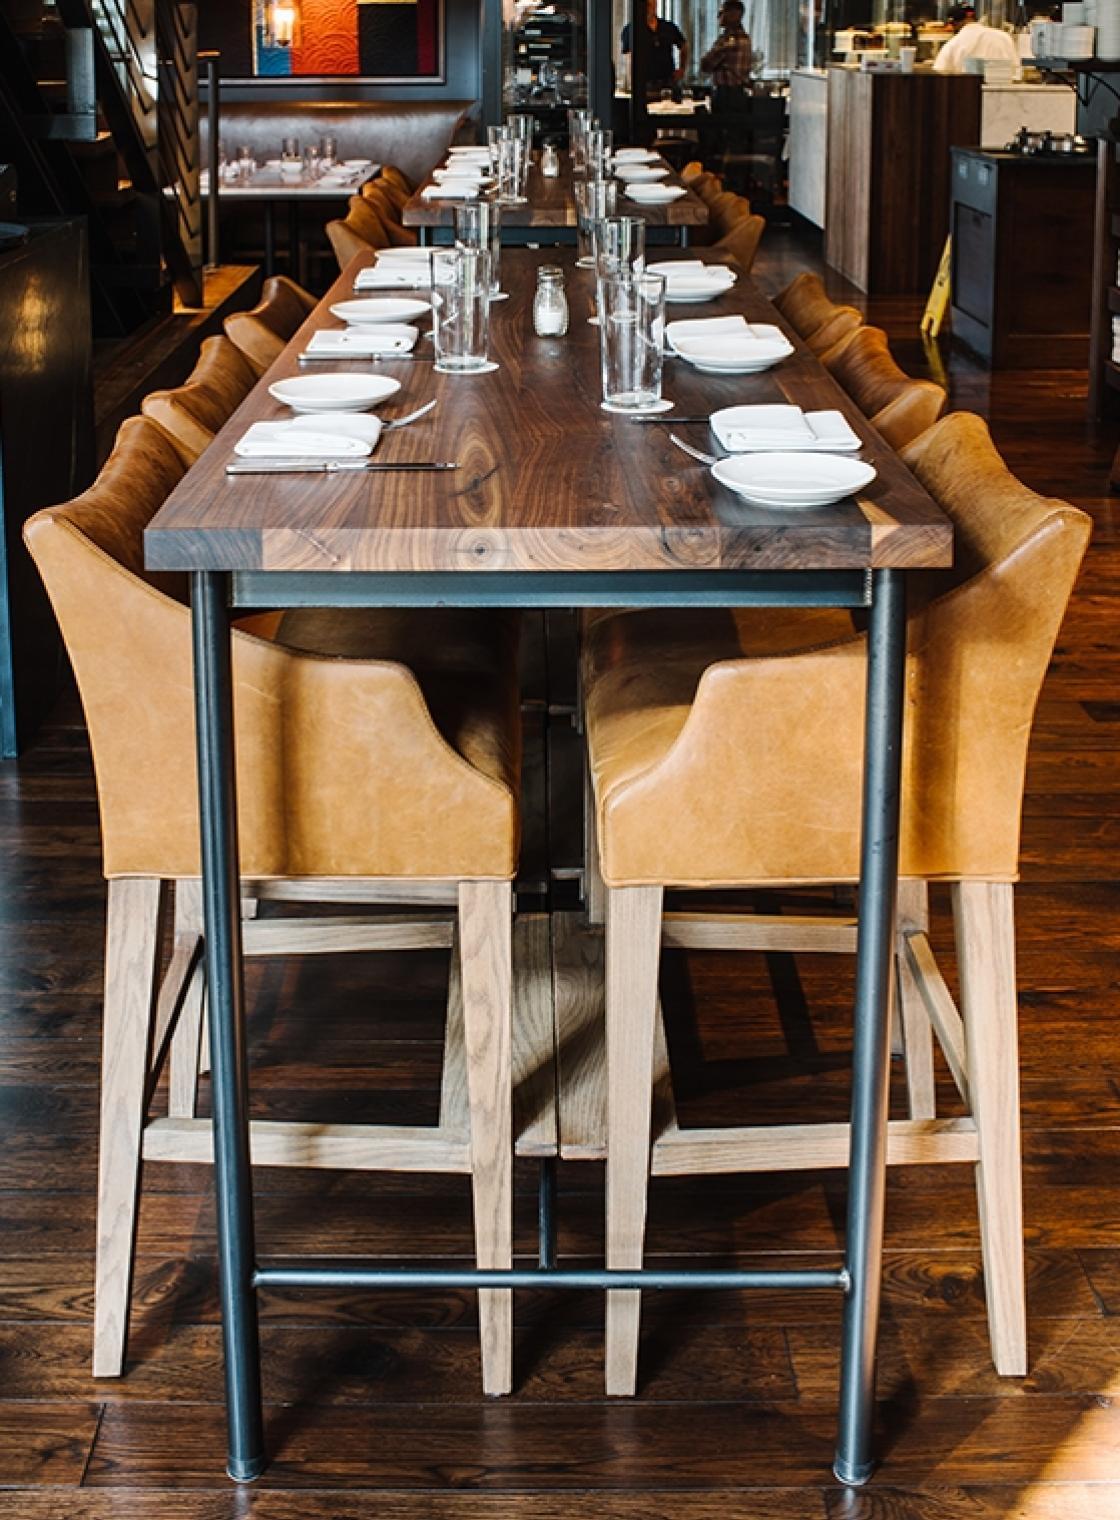 back to restaurants - South City Kitchen Buckhead